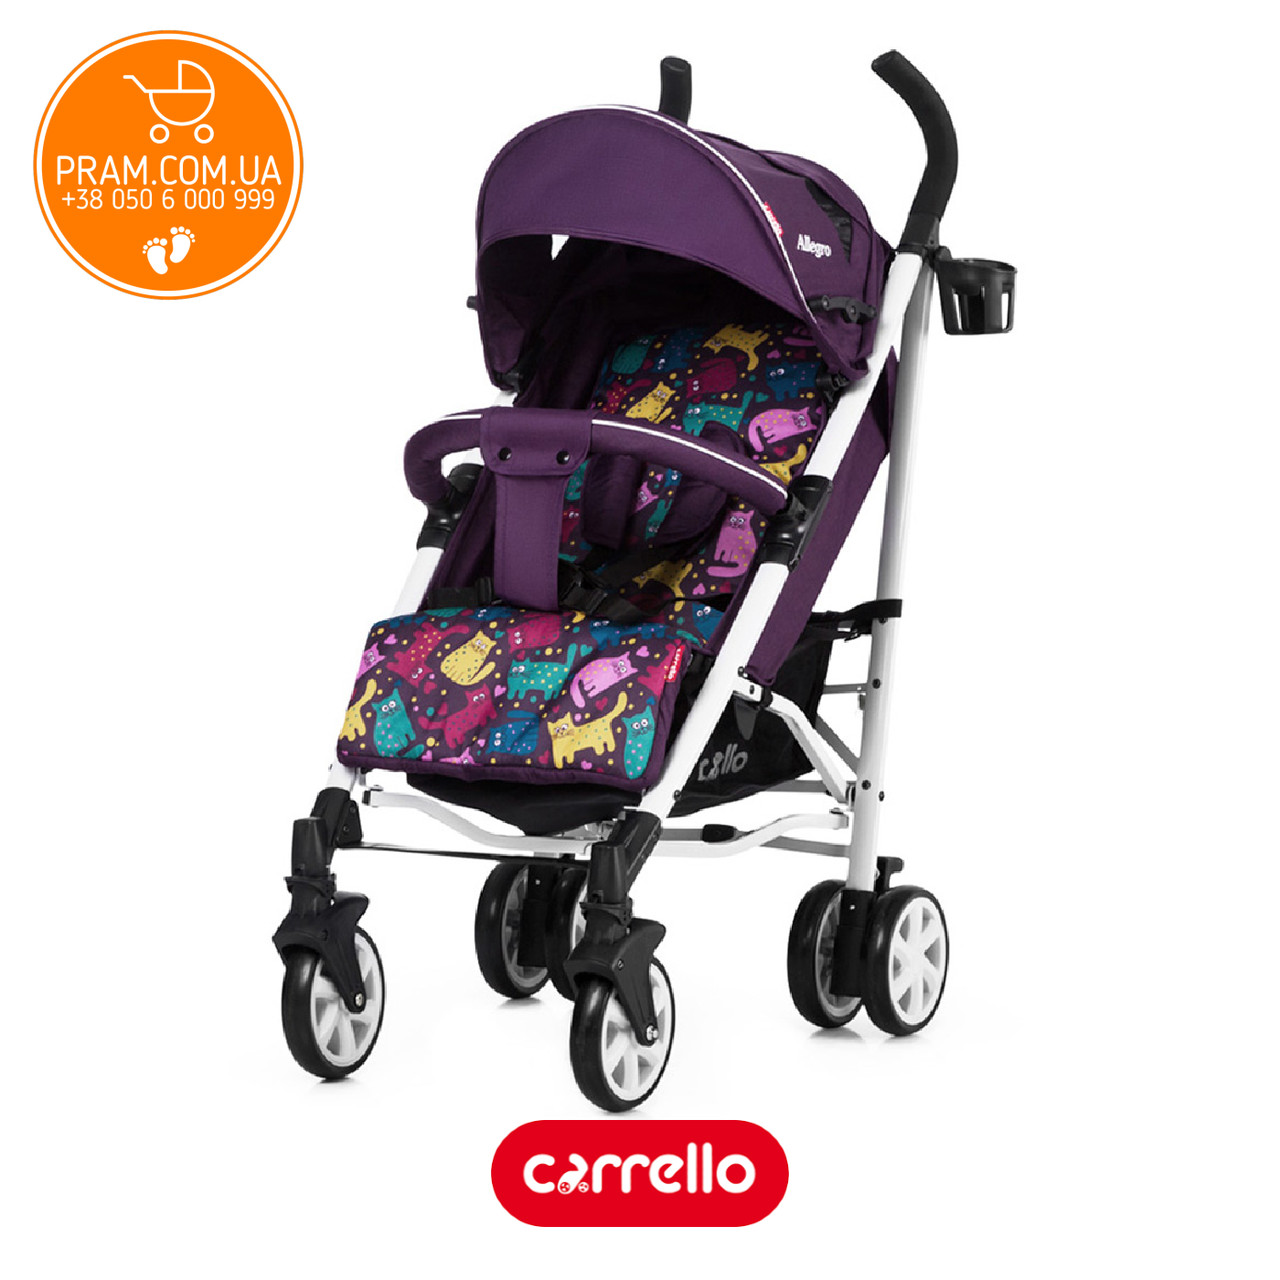 Прогулочная коляска Carrello Allegro Len CRL-10101 Kitty Purple